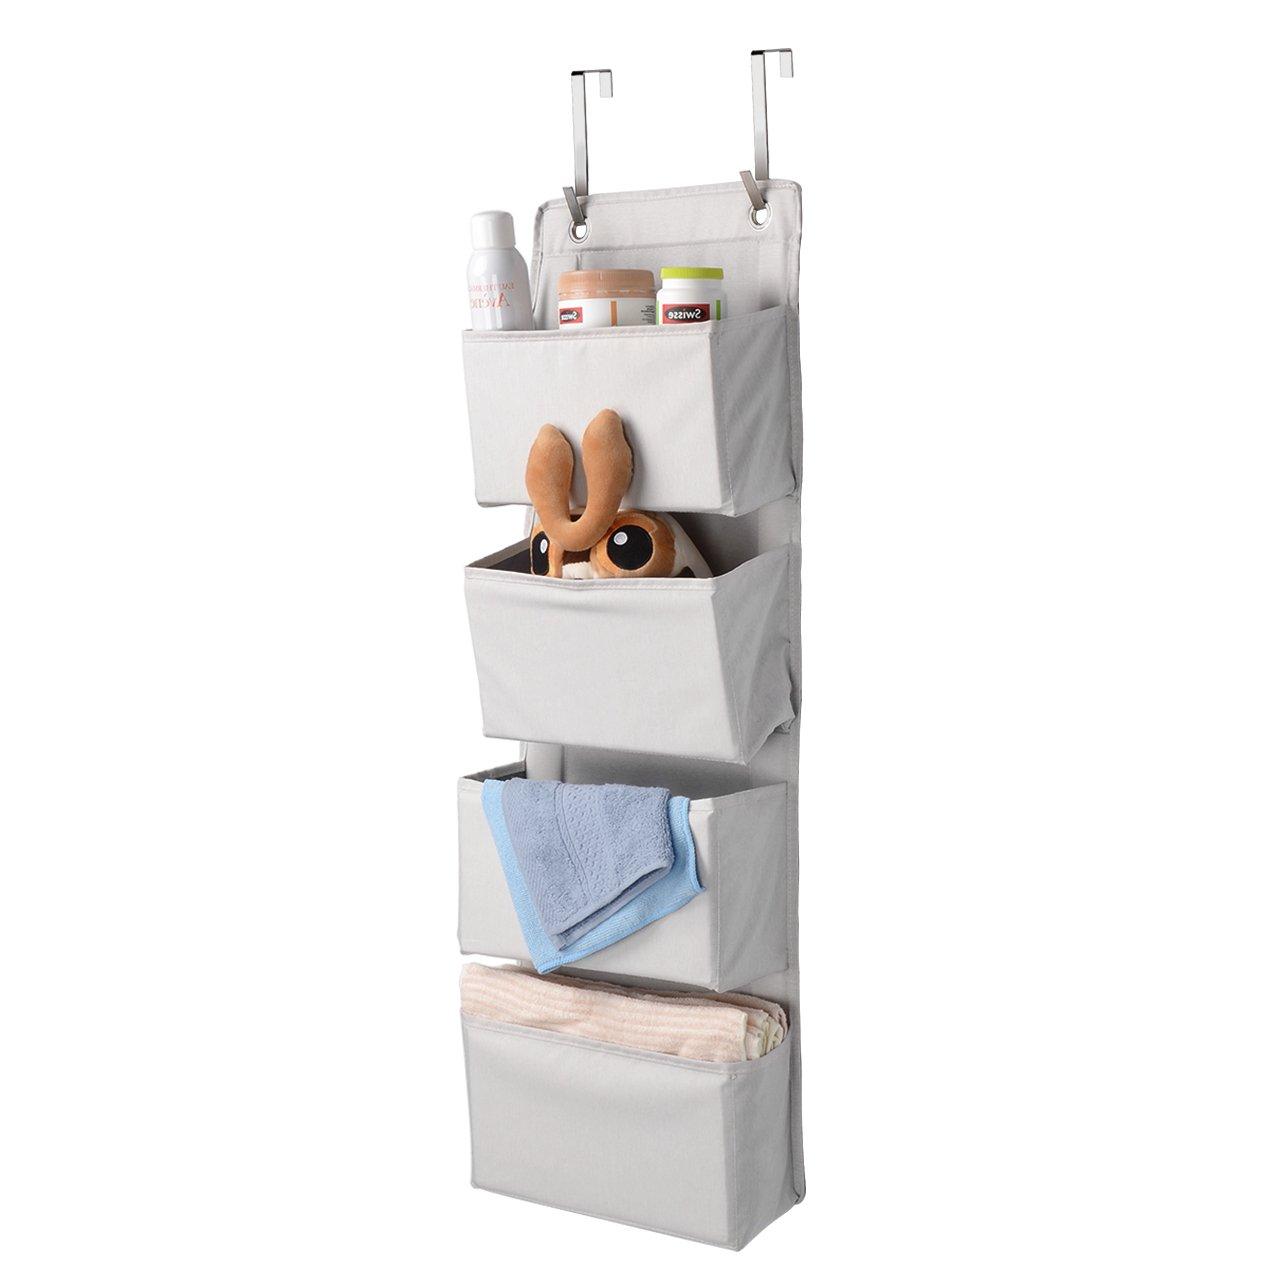 SortWise 4 Pockets Over Door Hanging Organizer, Polyester Wall Closet Storage Bag Case with 2 Metal Hooks for Bedroom, Kitchen, Bathroom